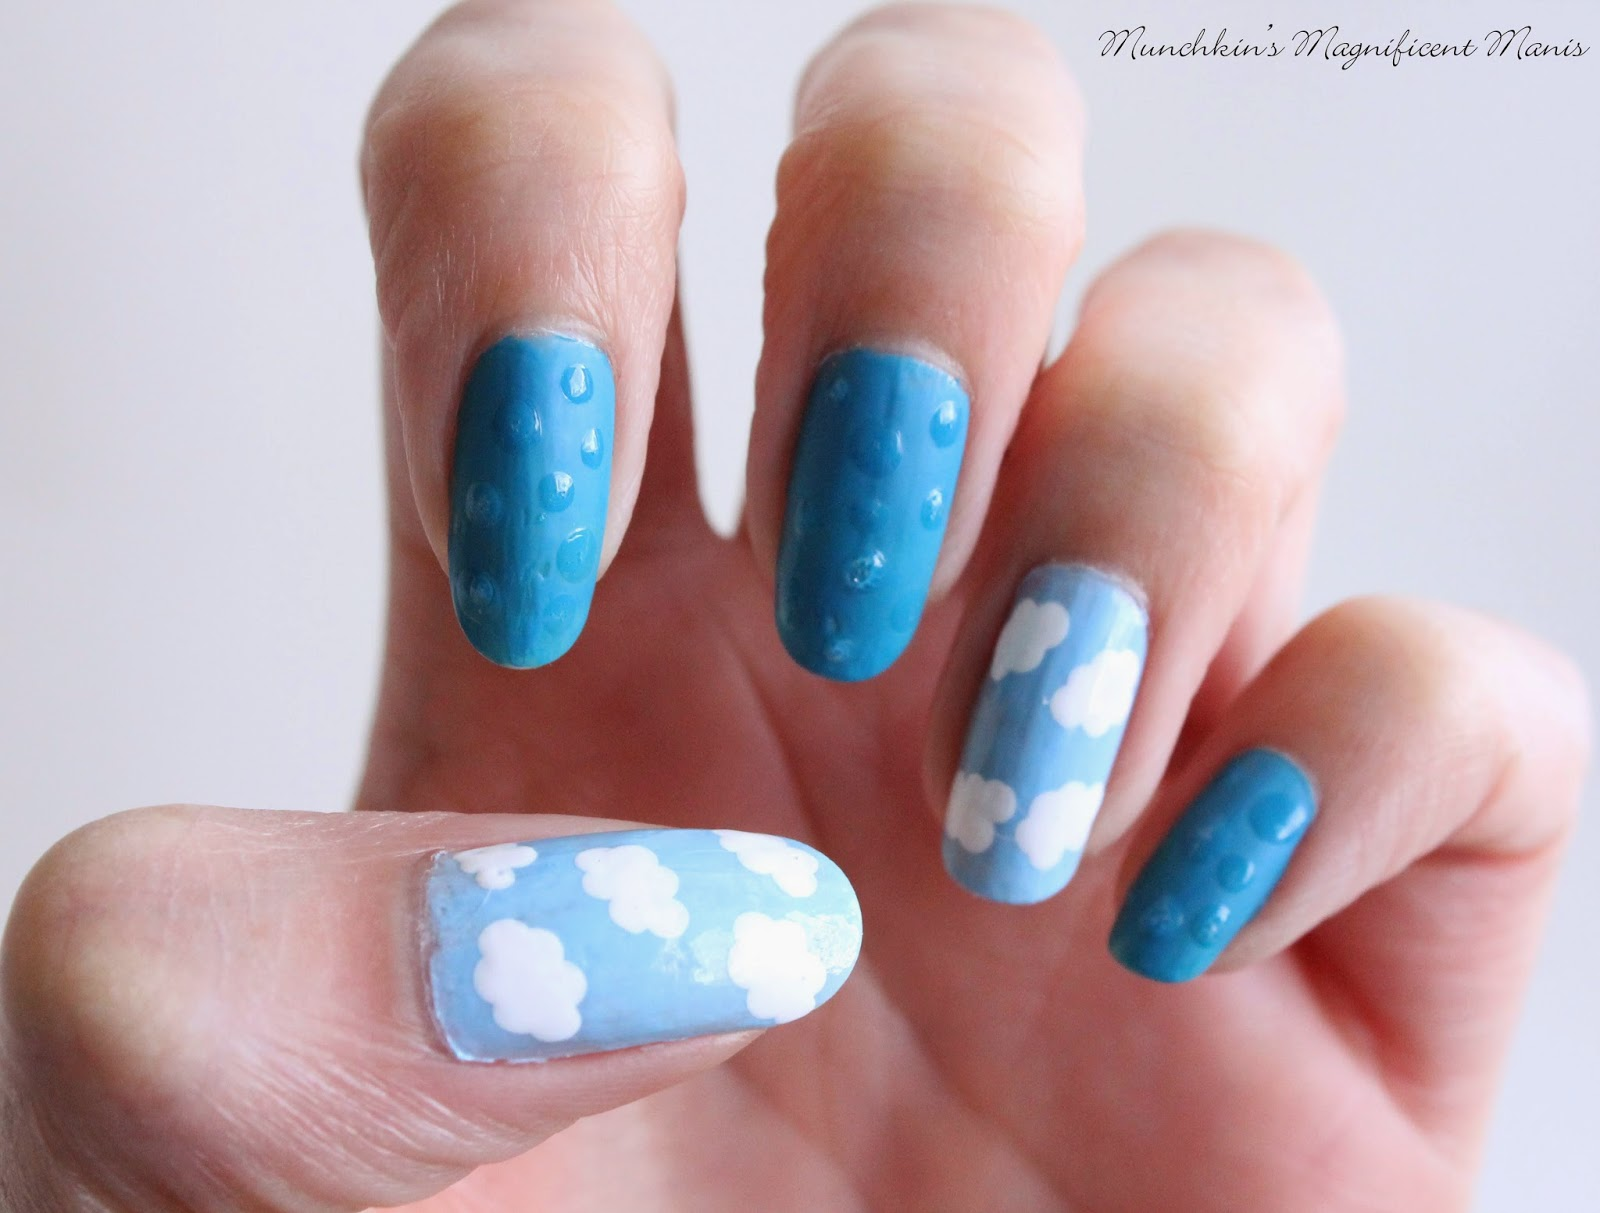 Rain drops and clouds nail design